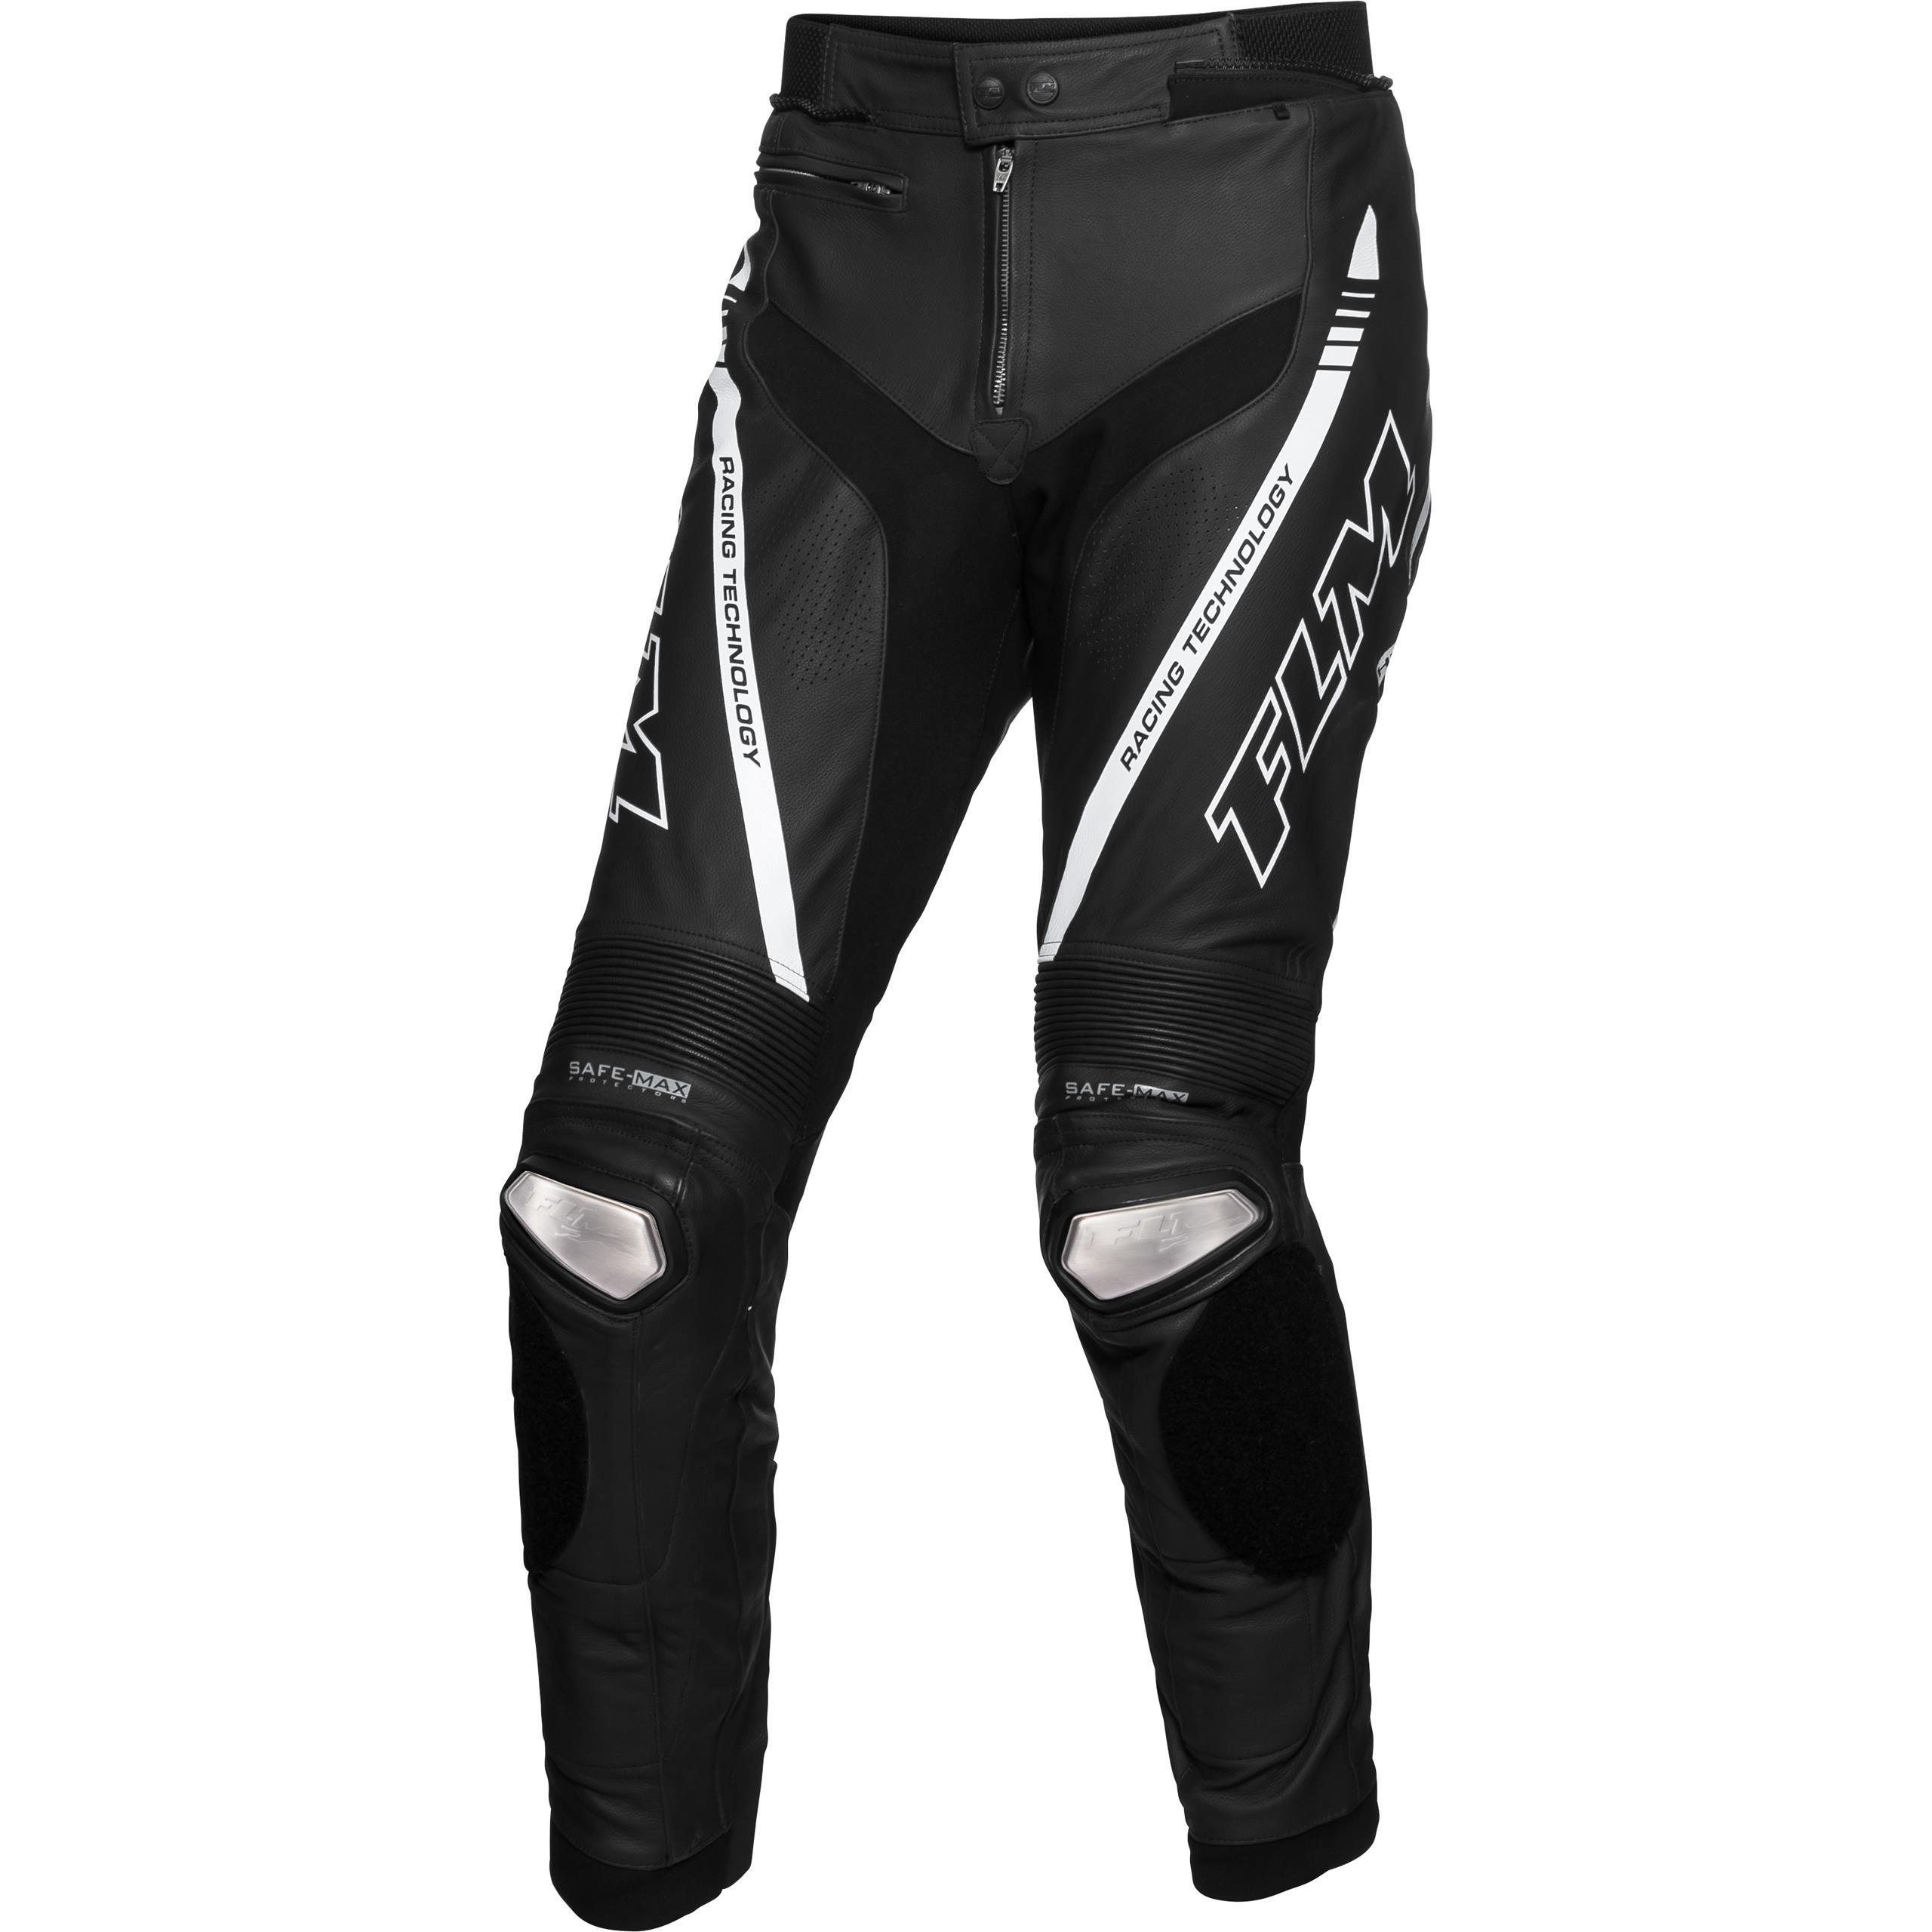 Ganzj/ährig FLM Motorradhose Sports Textilhose 1.1 Sportler Herren